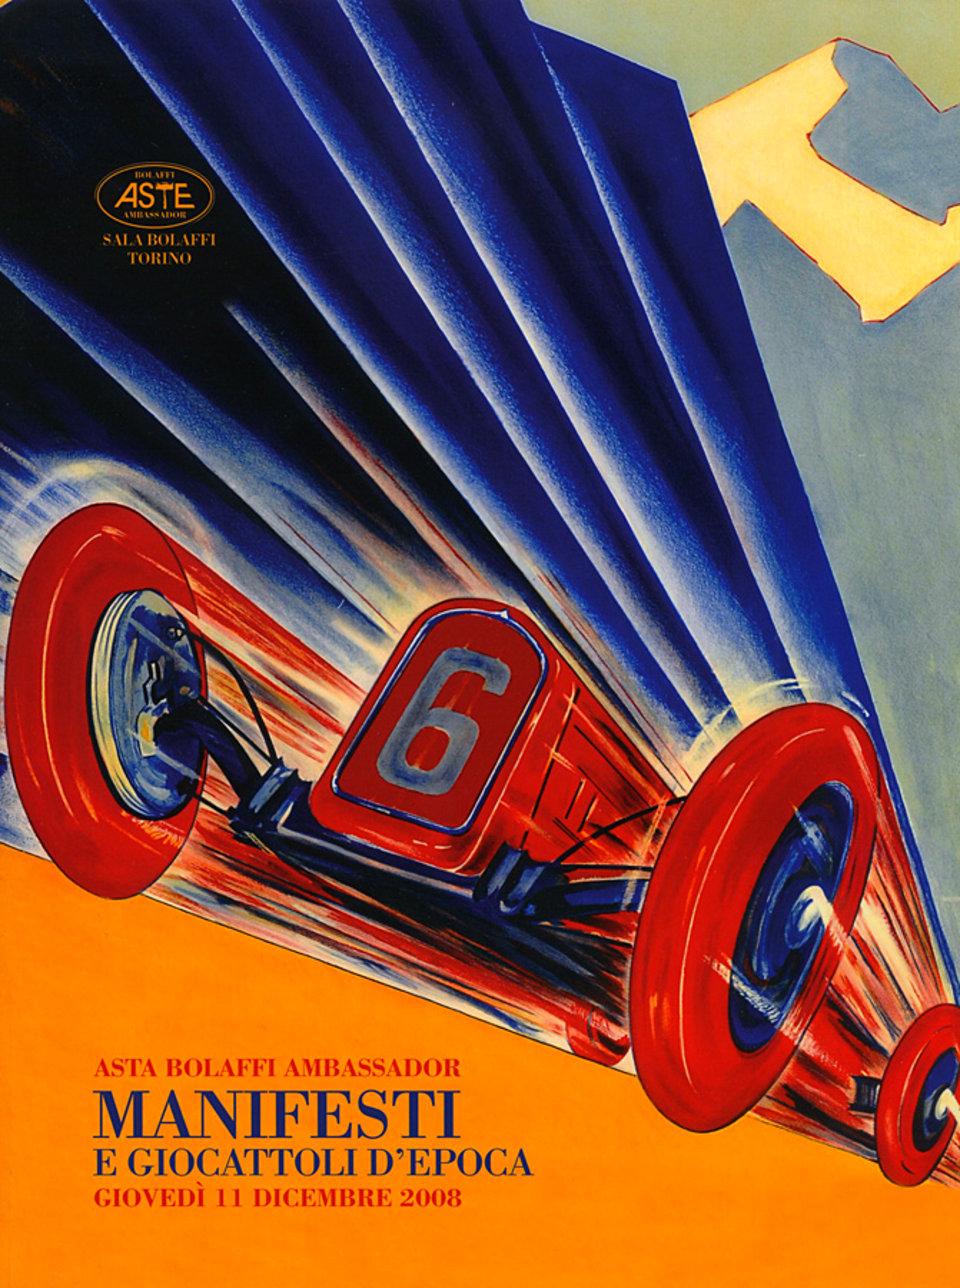 Asta Bolaffi Ambassador: Manifesti 2008 Italian Catalog